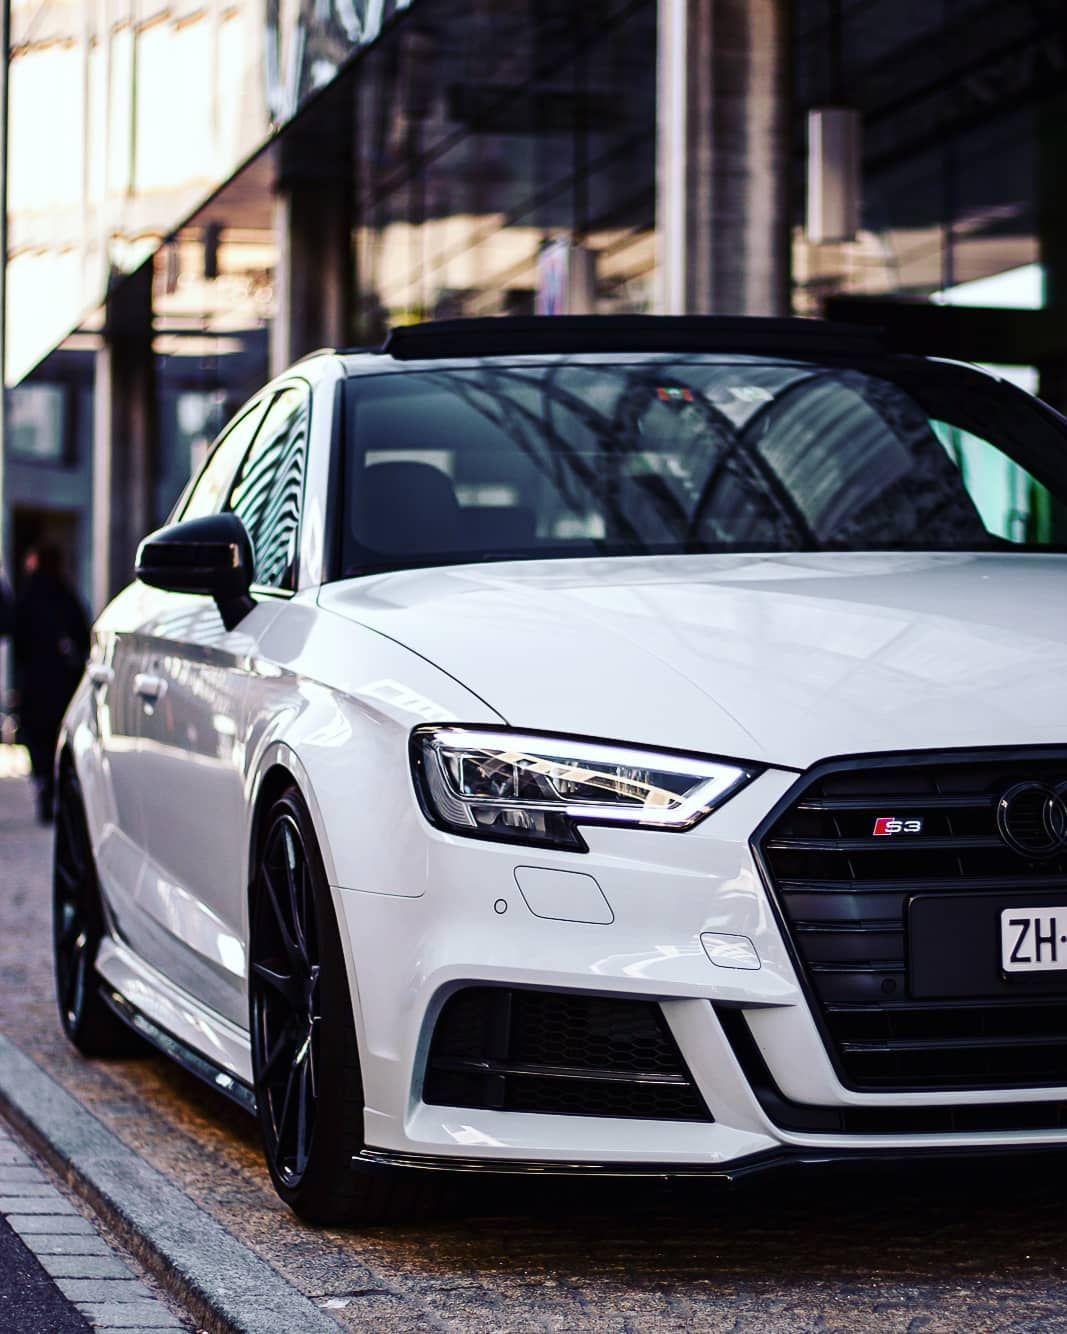 Audi S3 Sedan Modified Audi S3 Sedan In 2020 Audi Rs3 Audi Sedan Audi